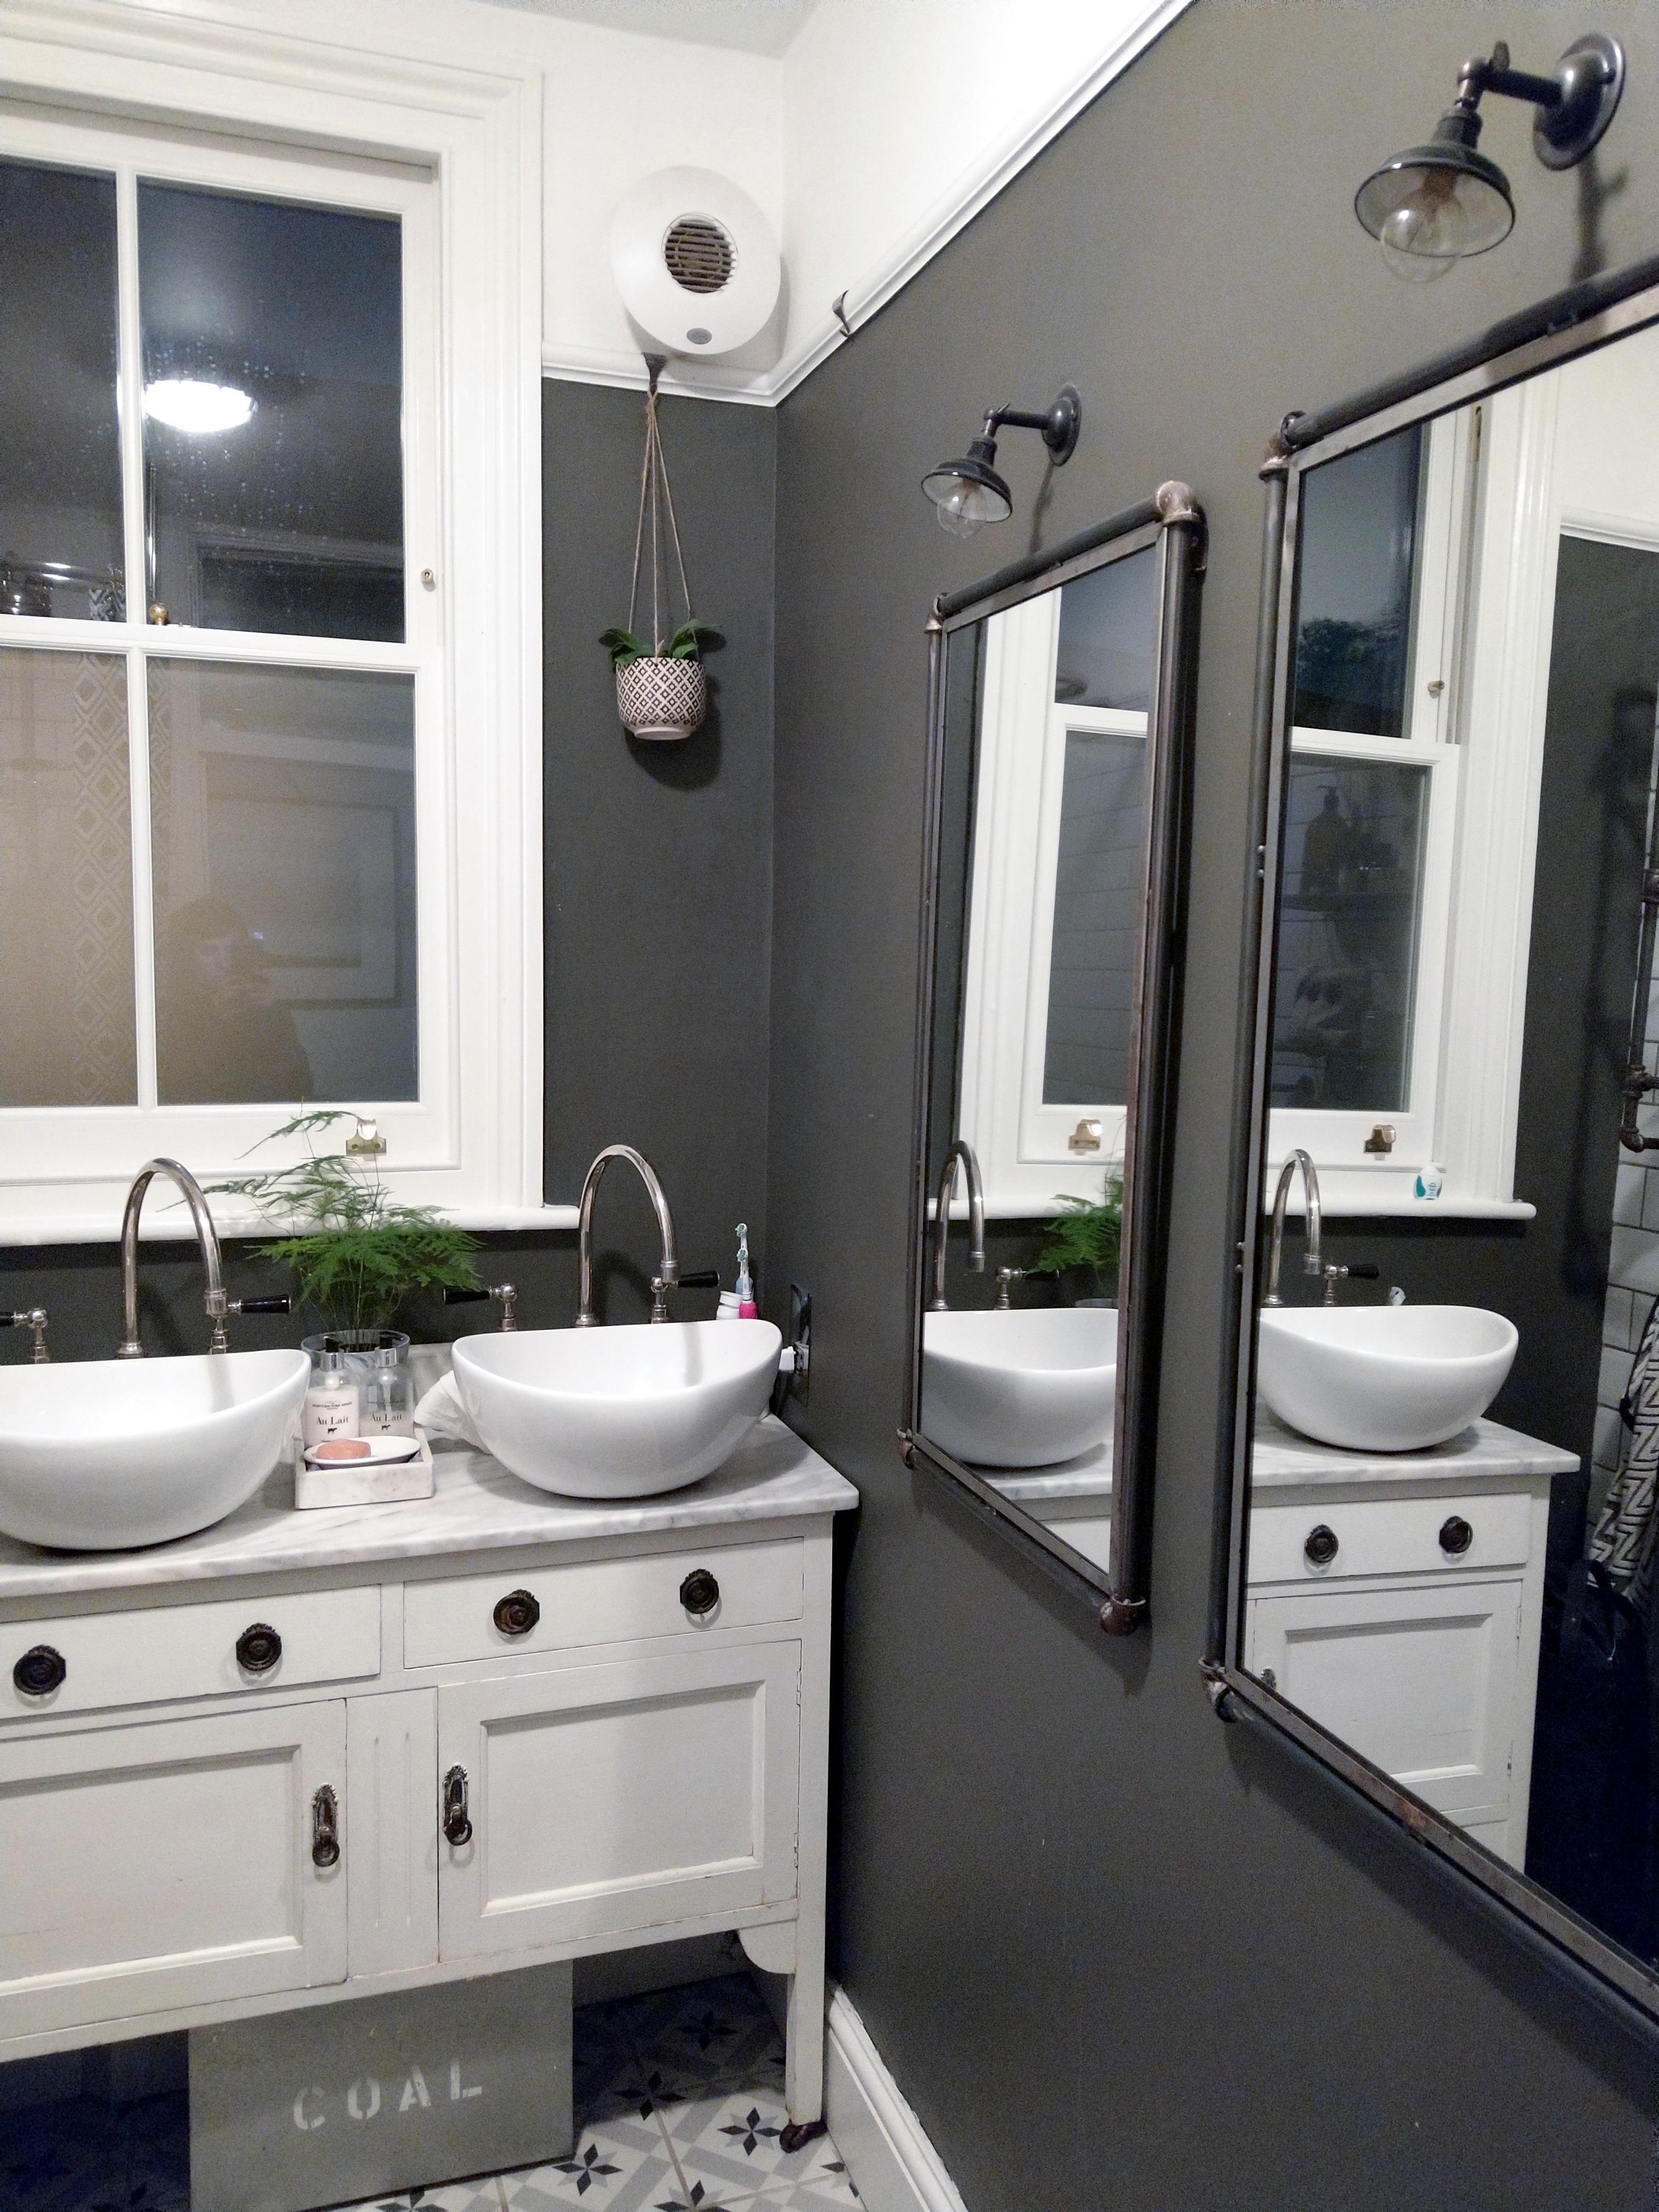 Monochrome Bathroom With Dulux Bowler Hat Paint Monochrome Bathroom Bathroom Model Bathroom Design